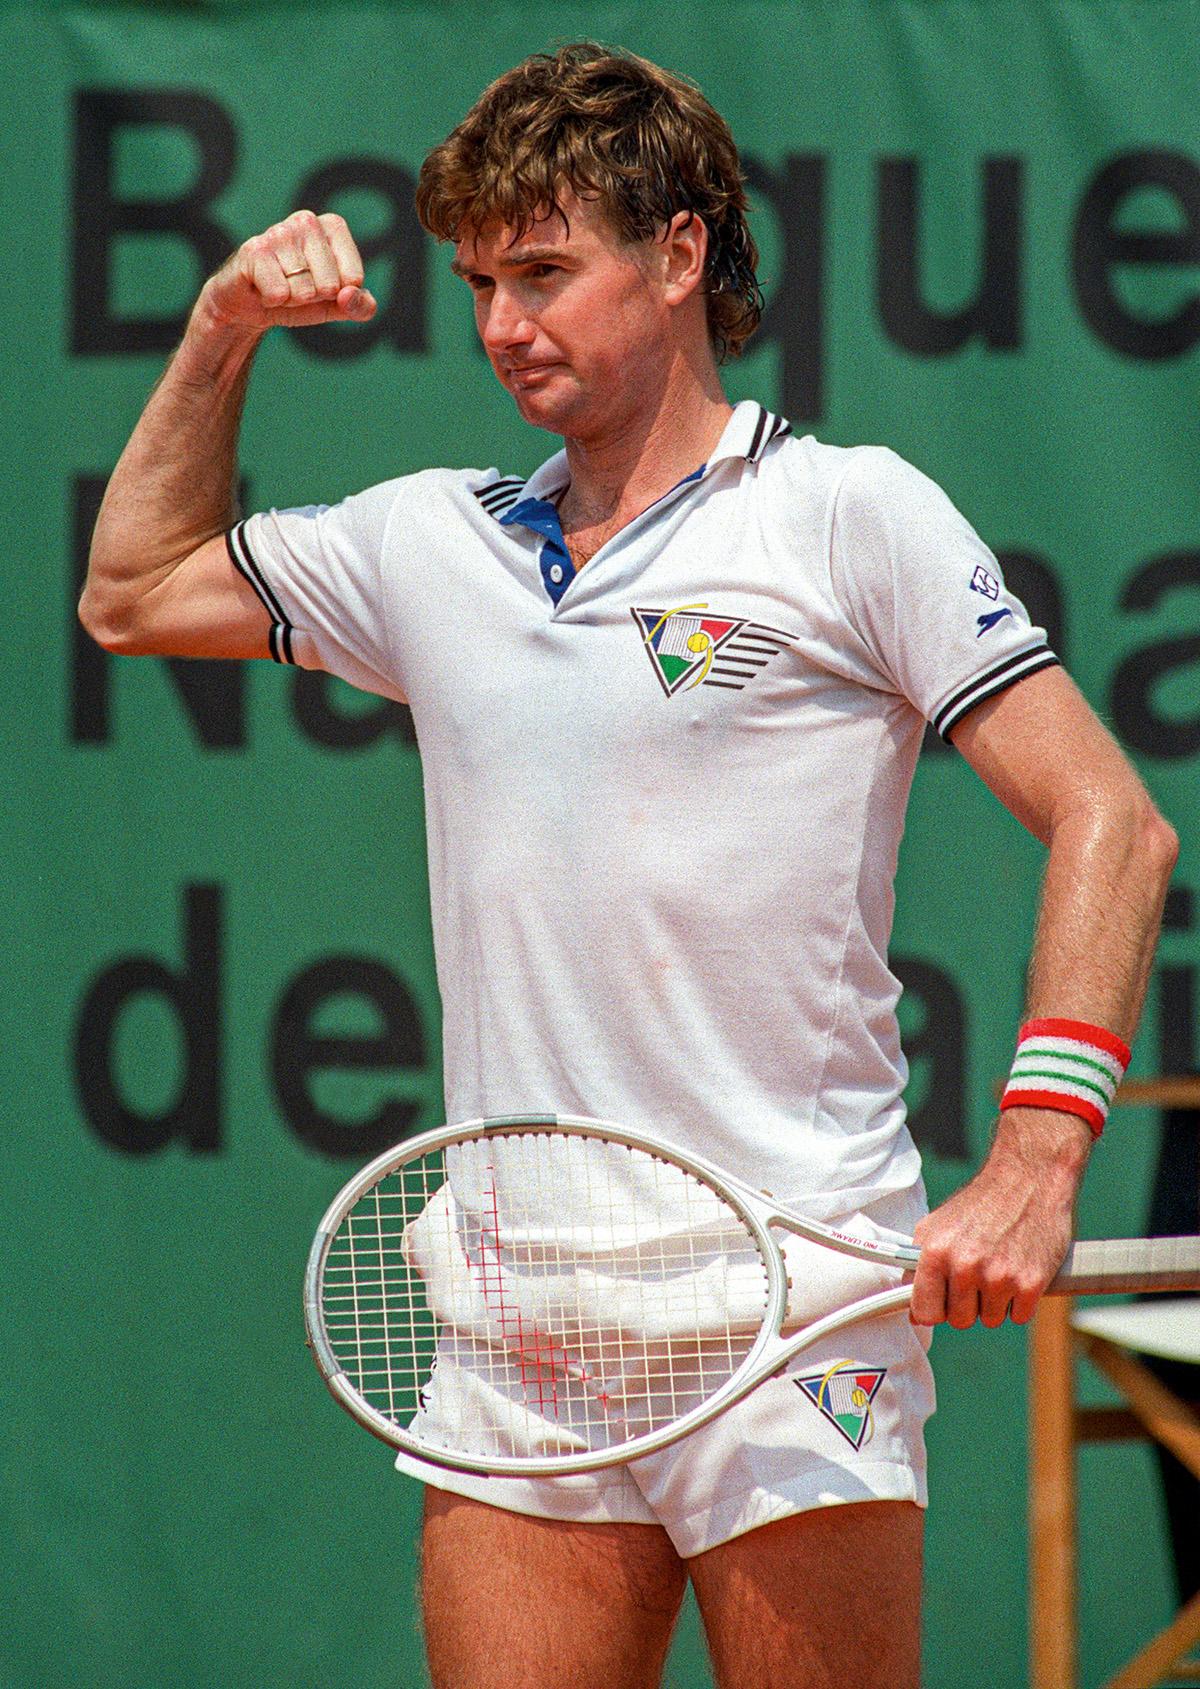 GOAT Federer Djokovic Nadal